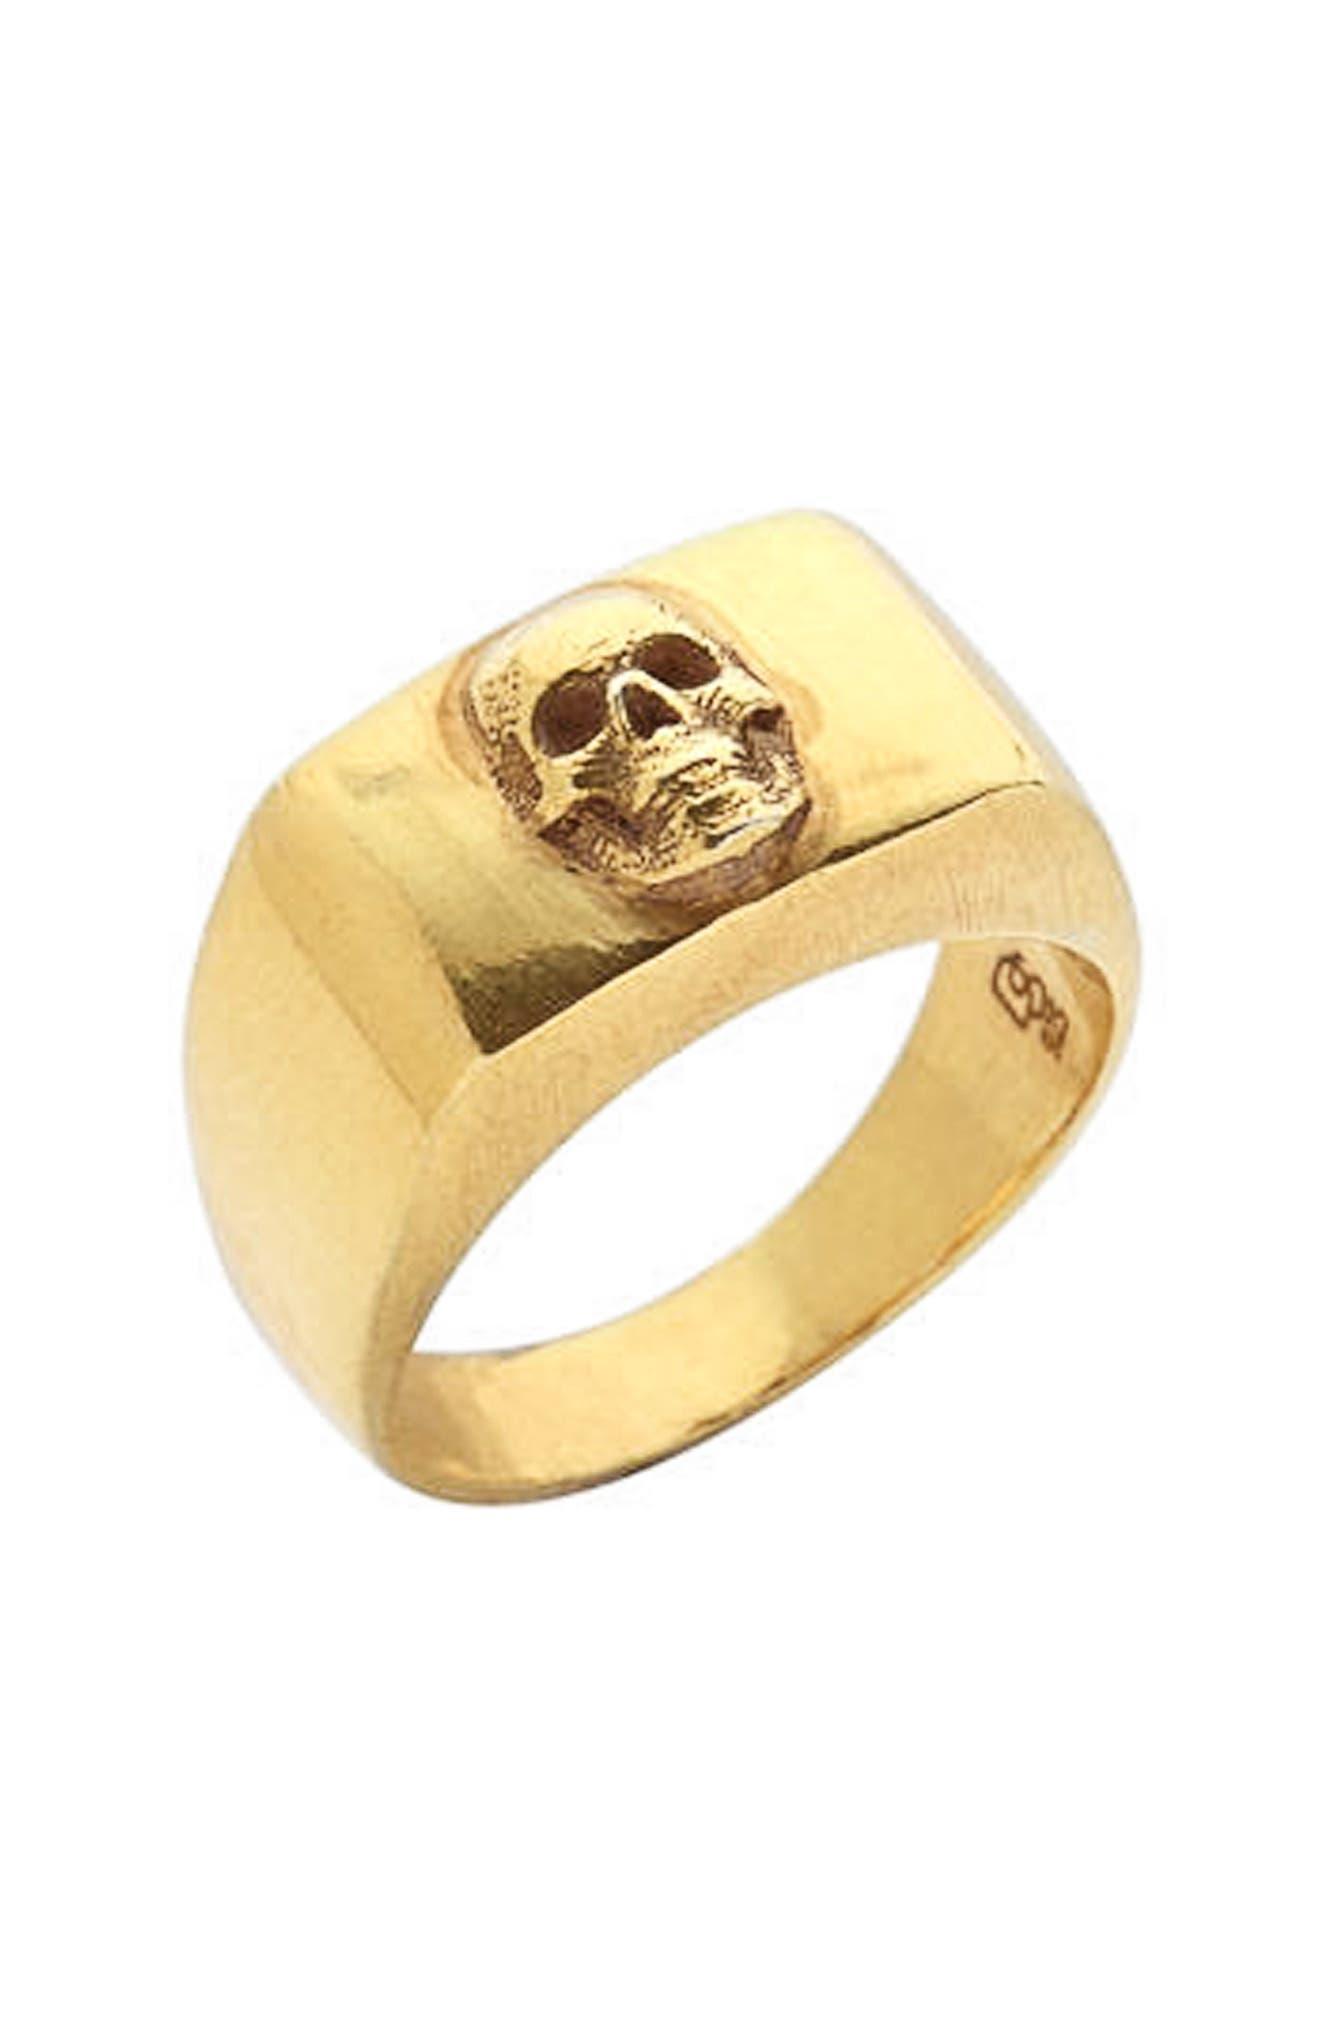 Main Image - Degs & Sal Skull Ring